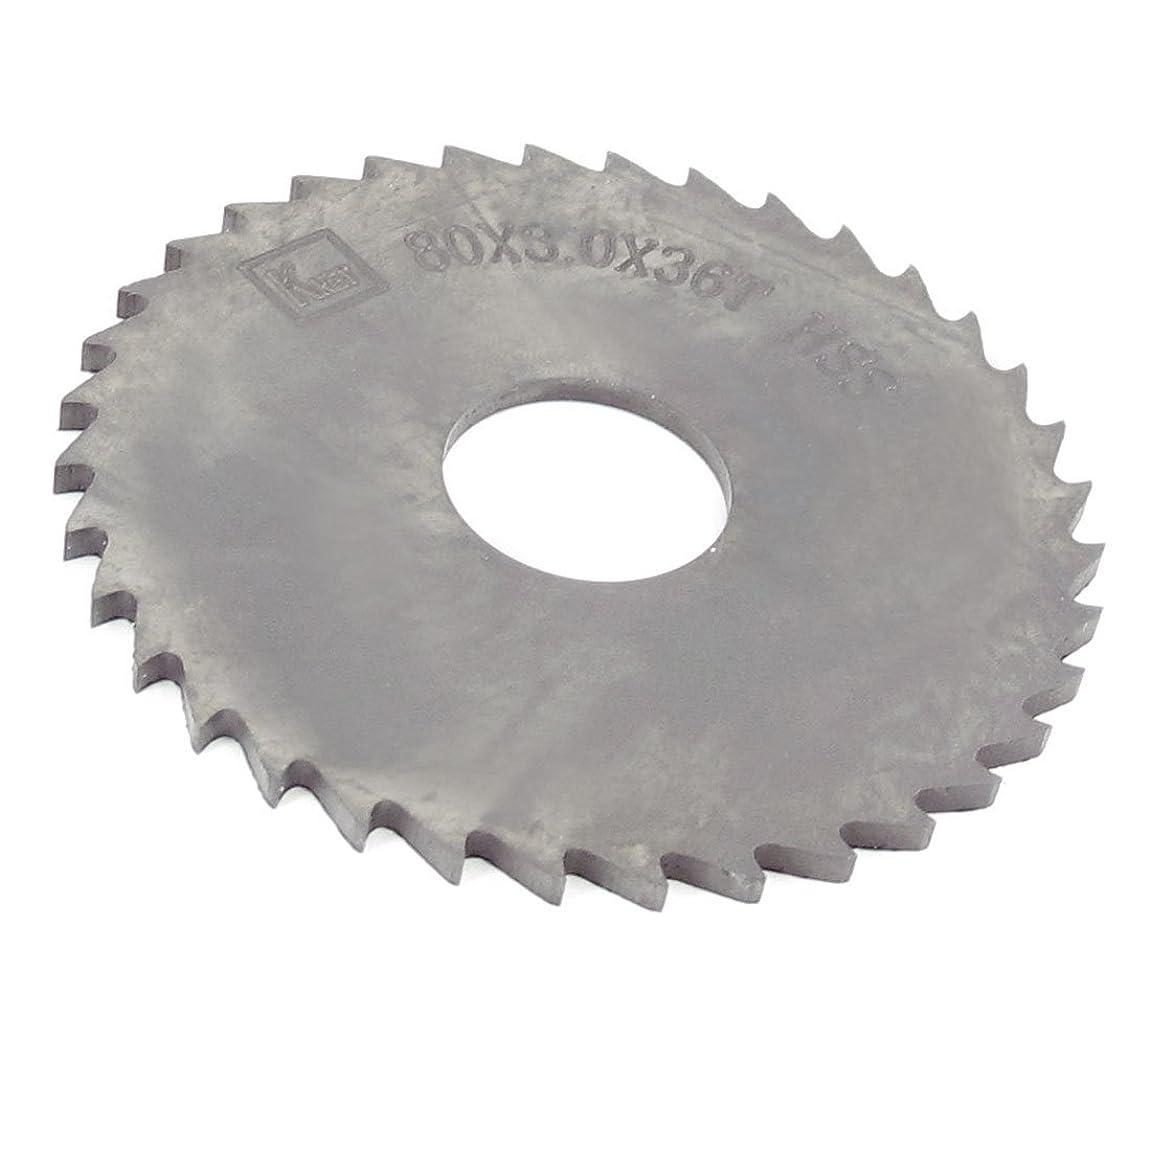 uxcell スリッティングソー 切削工具 ペグ歯 36歯 厚さ3mm 外径80mm 穴径22mm 1個入り